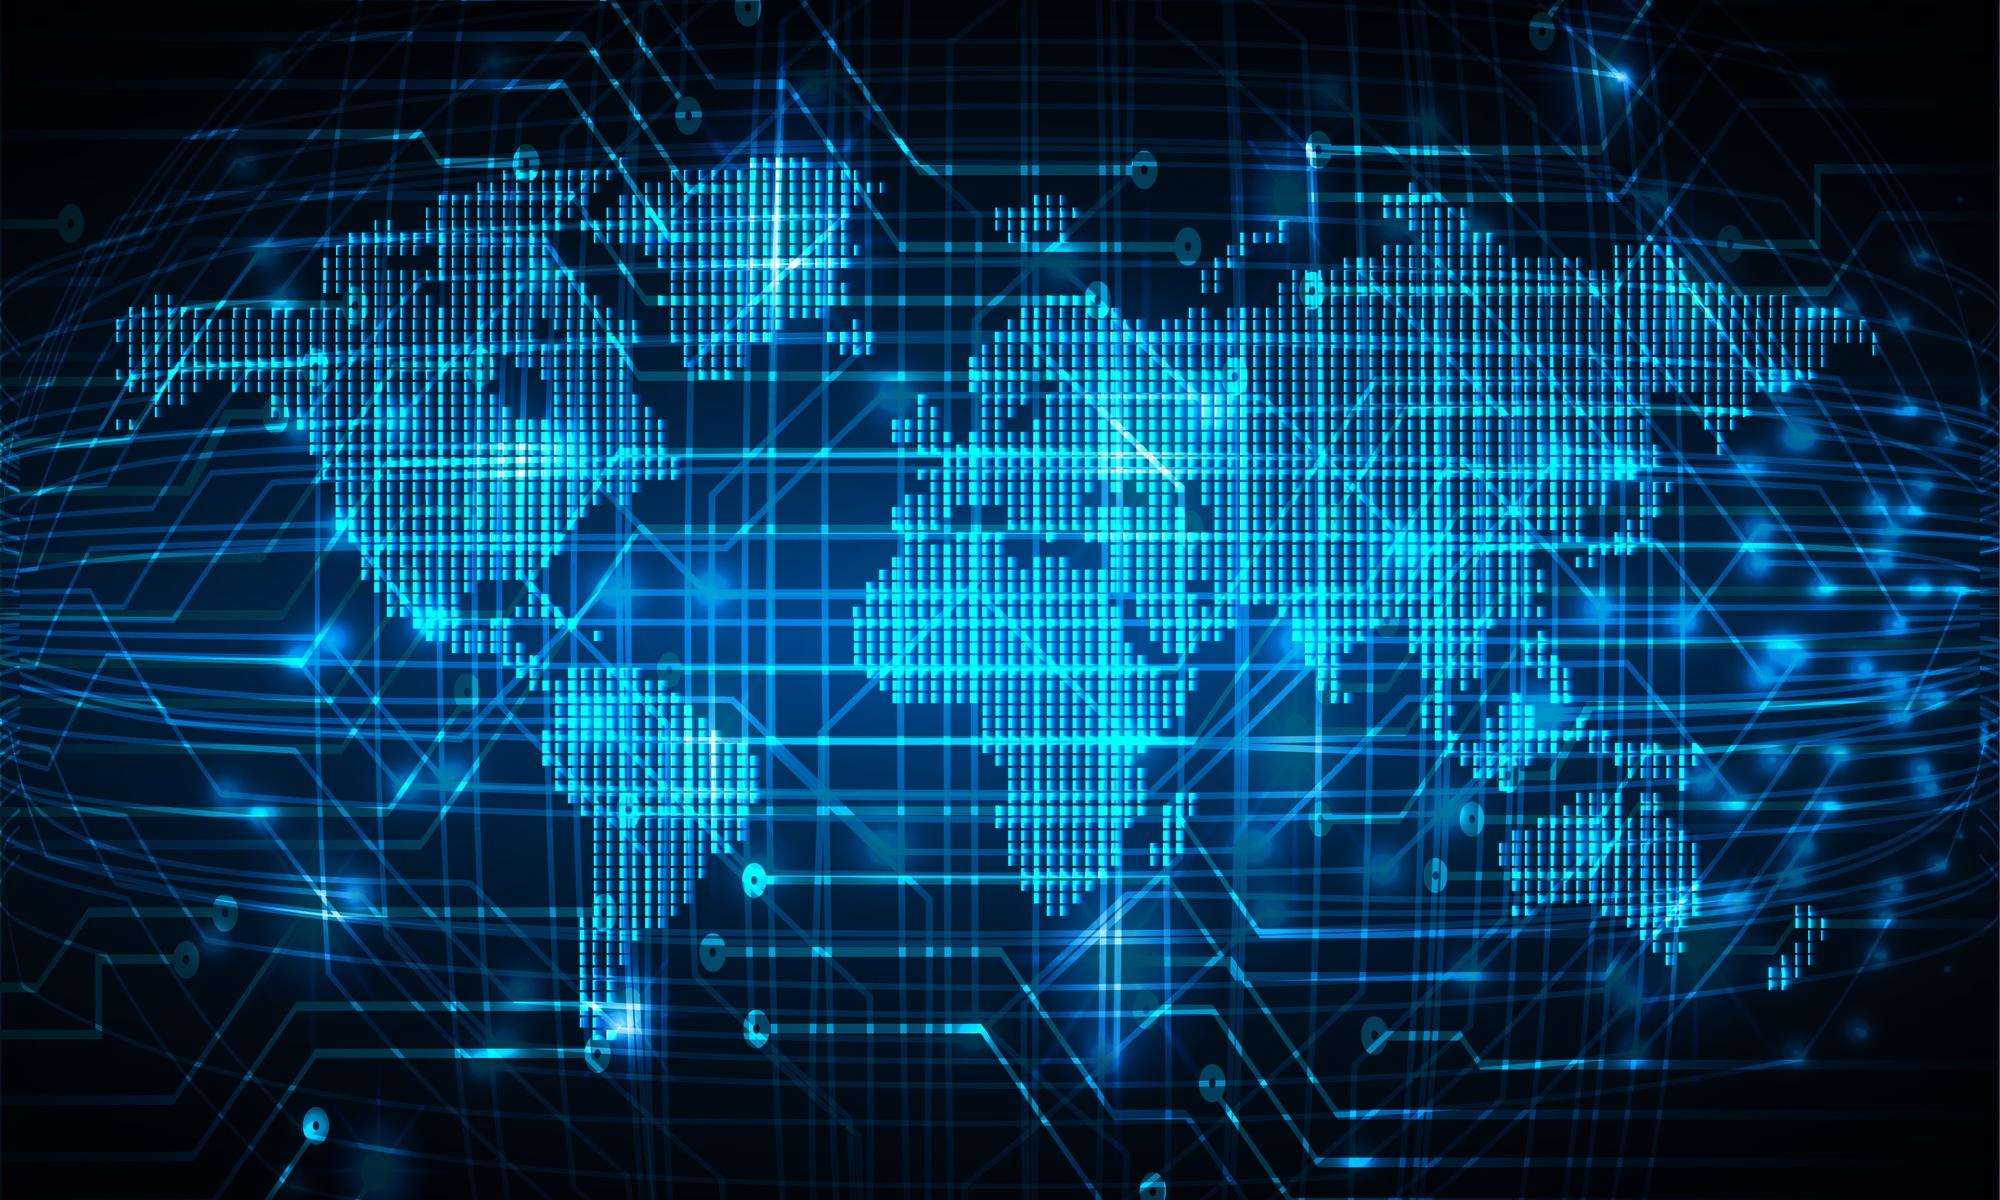 the interwebz – an exploration